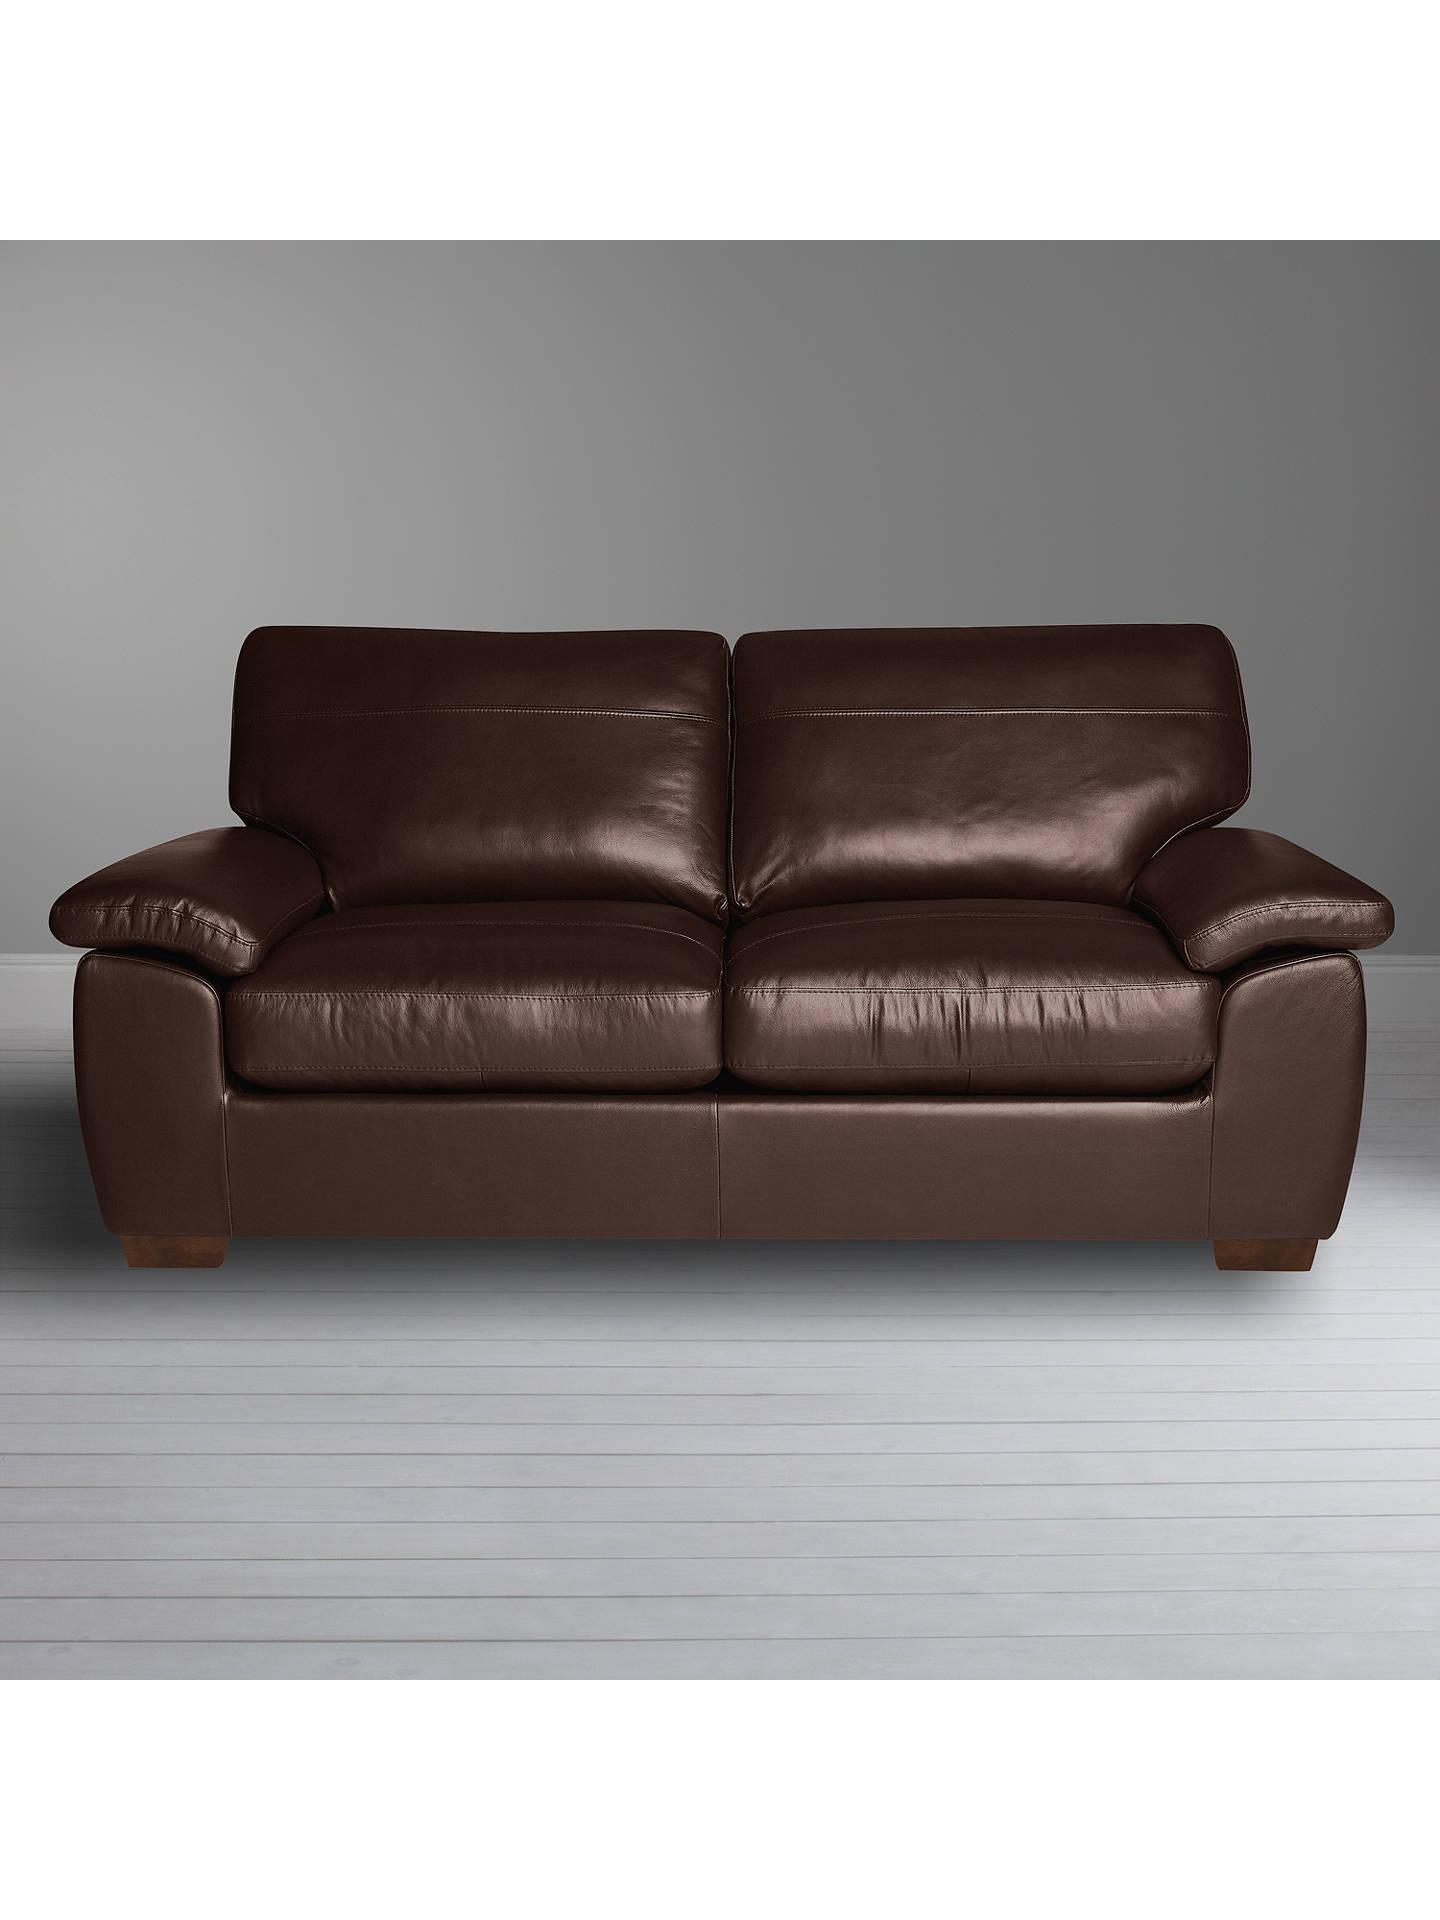 Surprising John Lewis Partners Camden Large 3 Seater Leather Sofa Dark Leg Nature Brown Home Interior And Landscaping Ponolsignezvosmurscom